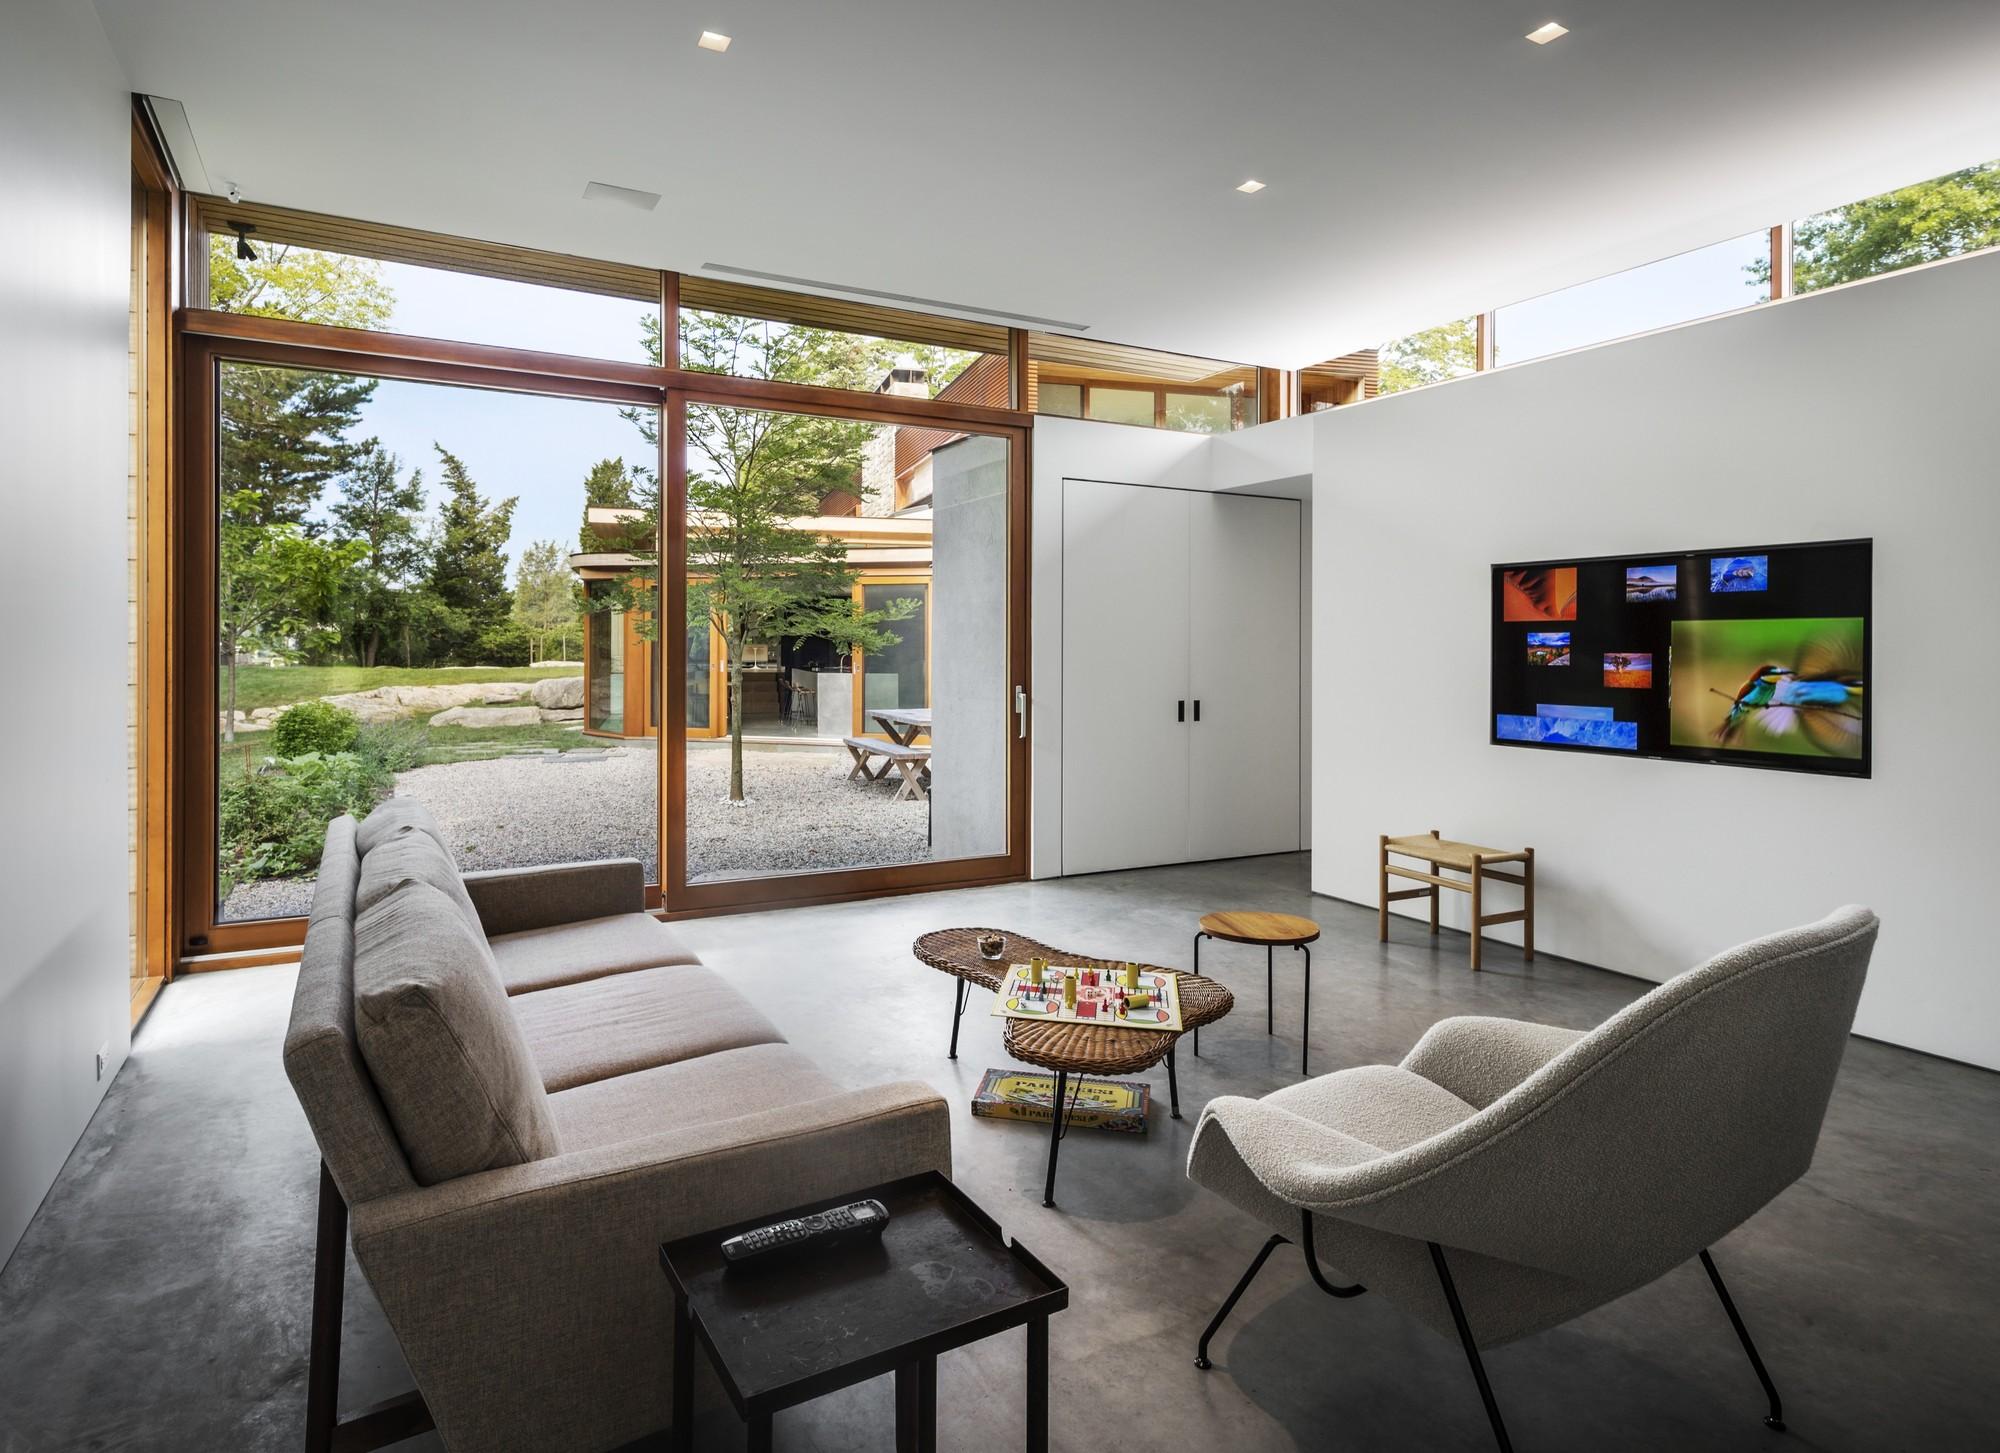 Stonington residence joeb moore partners archdaily - Stonington residence by joeb moore partners ...